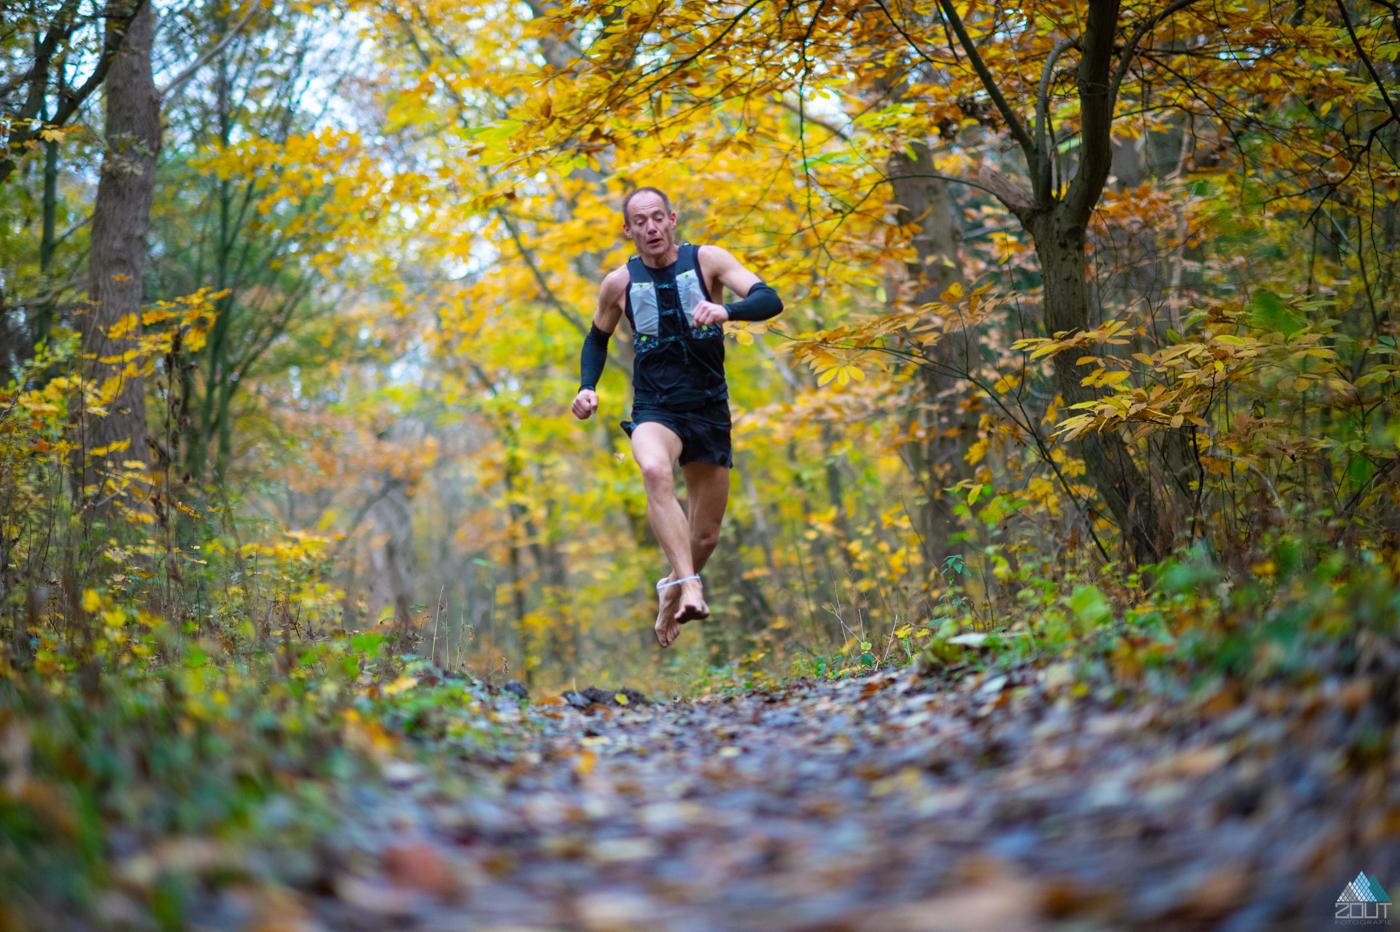 hardlopen blotevoeten Graef Castricum Trail foto Zout Fotografie